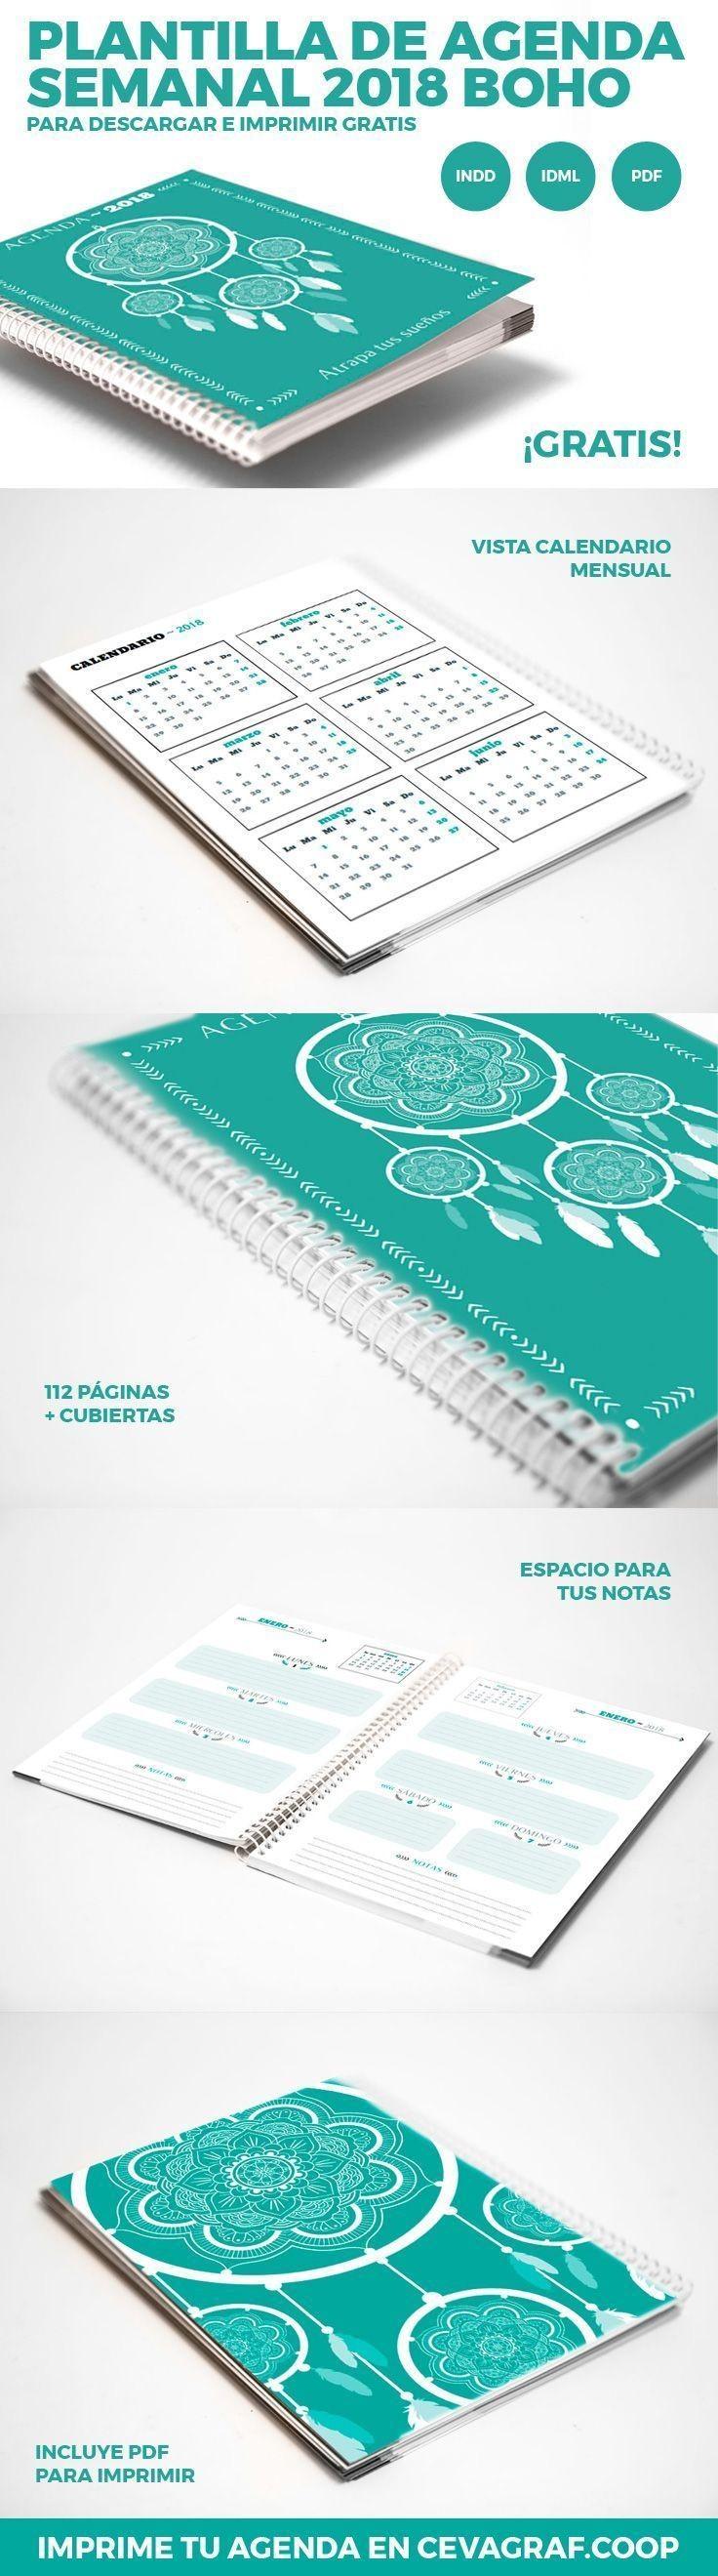 Calendario Para Imprimir Copa 2019 Recientes Mejores 396 Imágenes De Descarga Plantillas Indesign Illustrator Of Calendario Para Imprimir Copa 2019 Más Arriba-a-fecha Nido guila Coapa Club América Sitio Icial